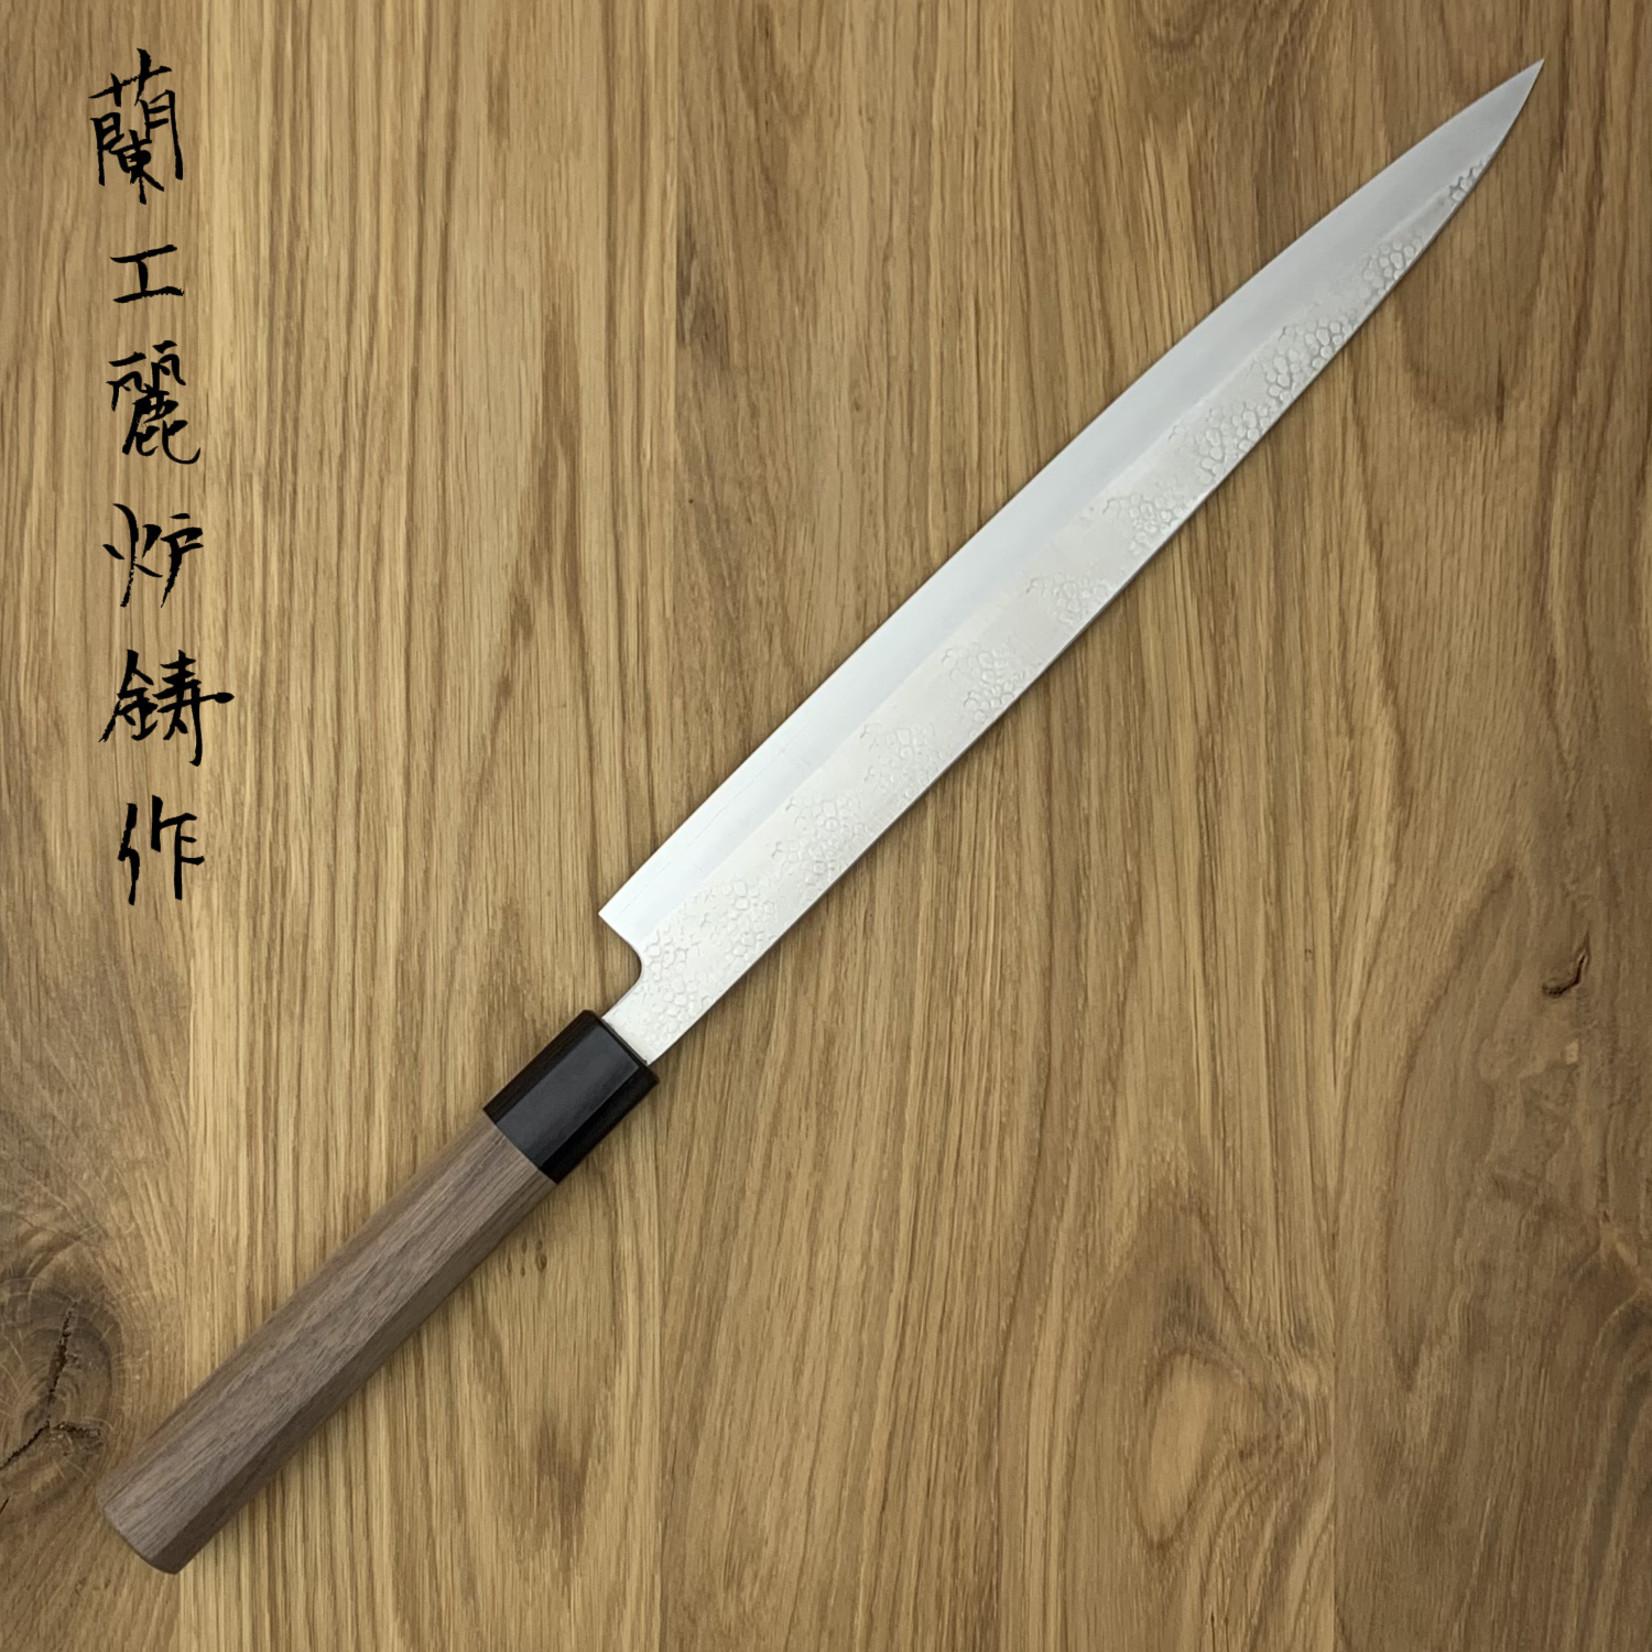 OKEYA GIN3 Tsuchime Sujihiki 270mm OS-G3T-SU270